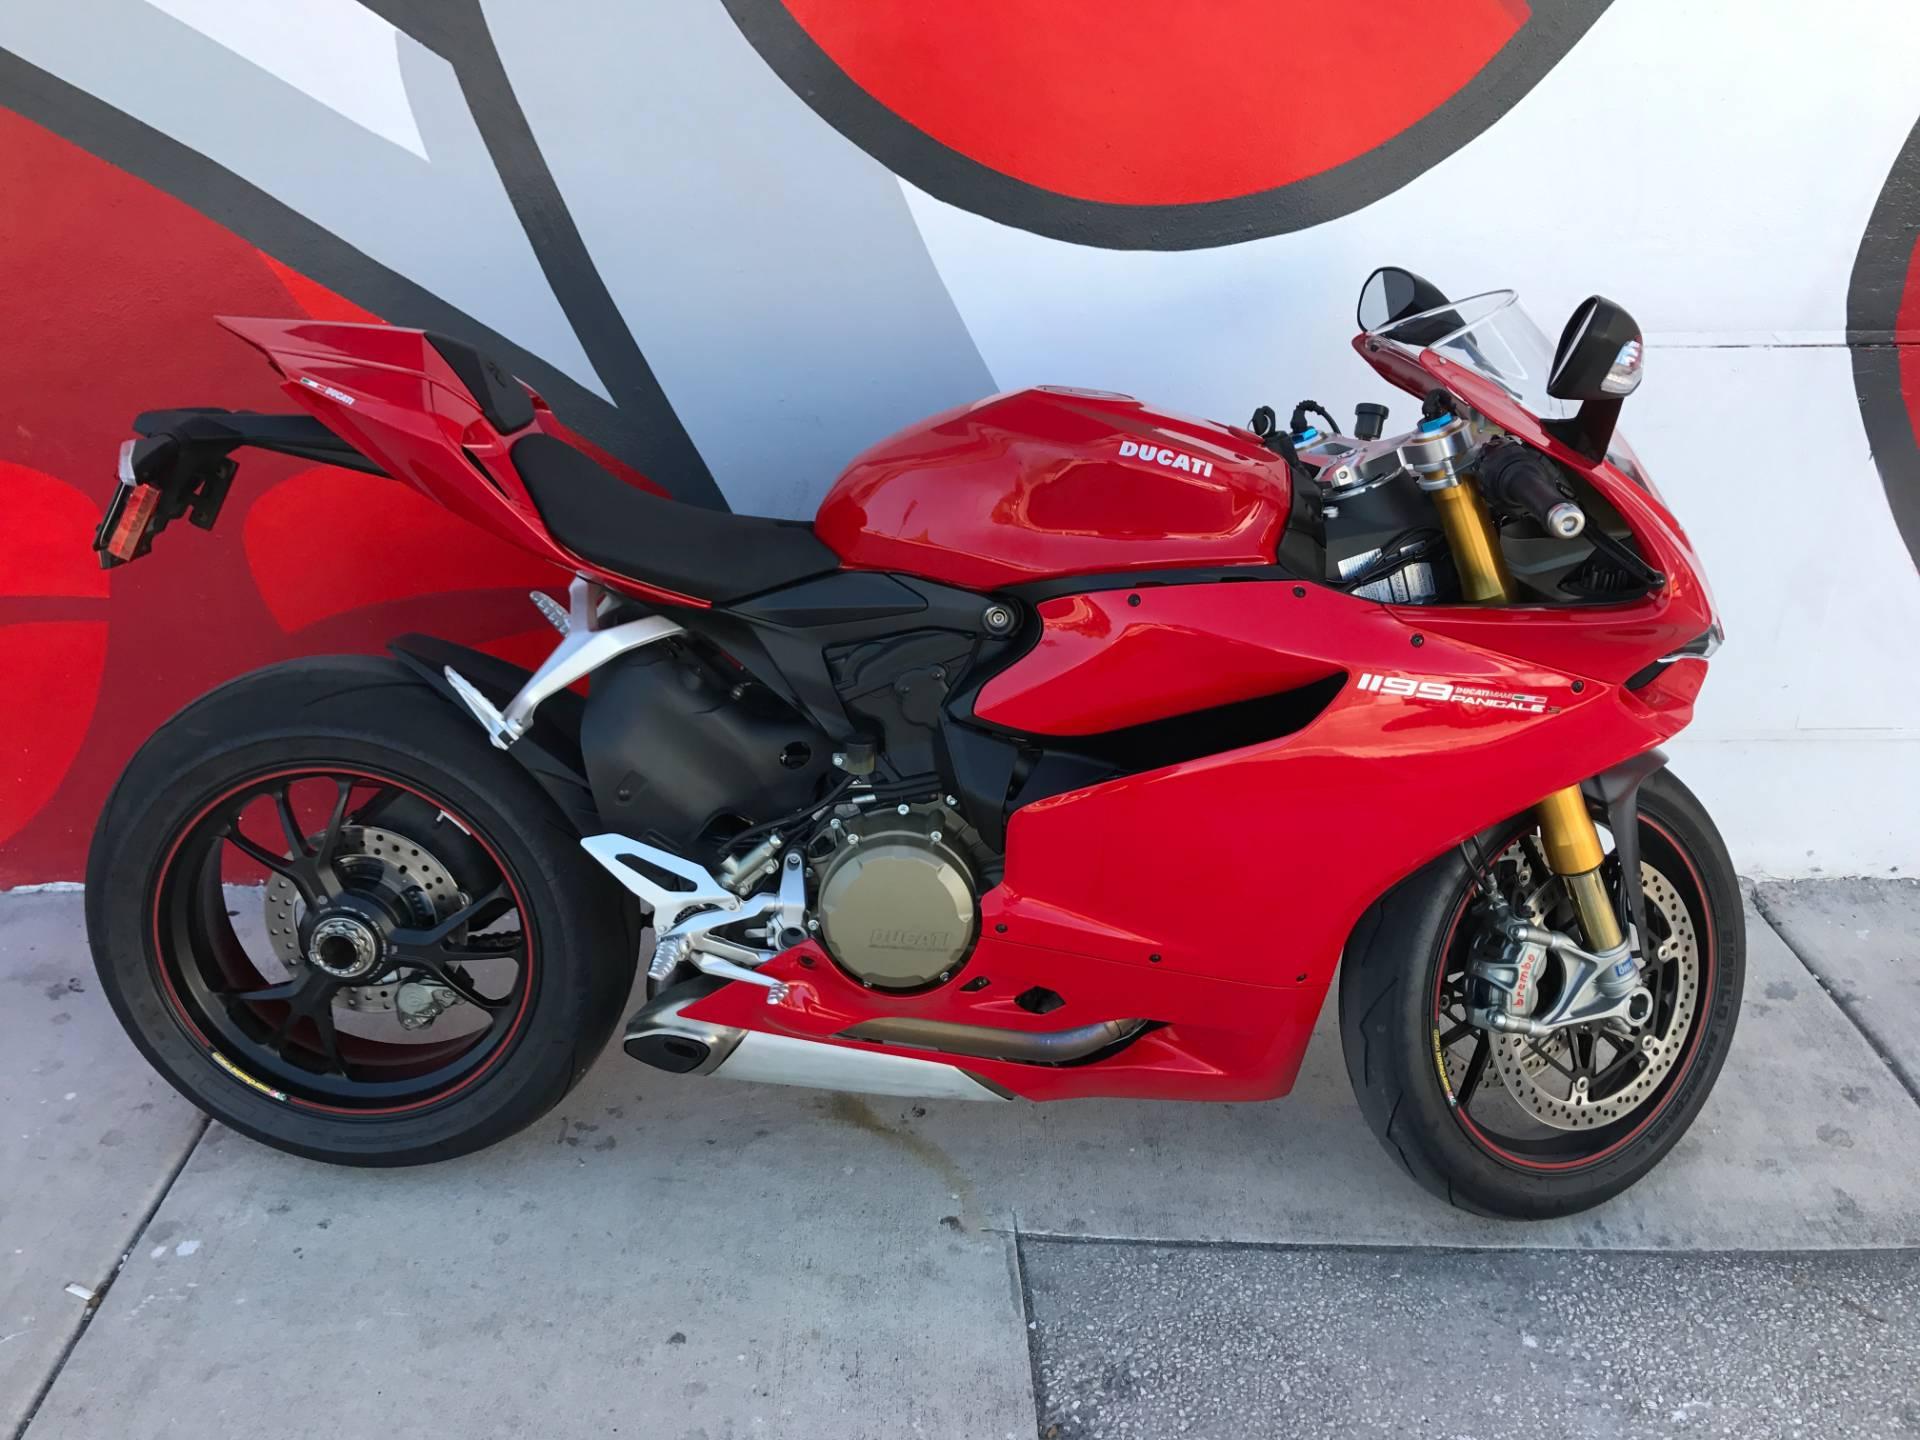 2014 Superbike 1199 Panigale S